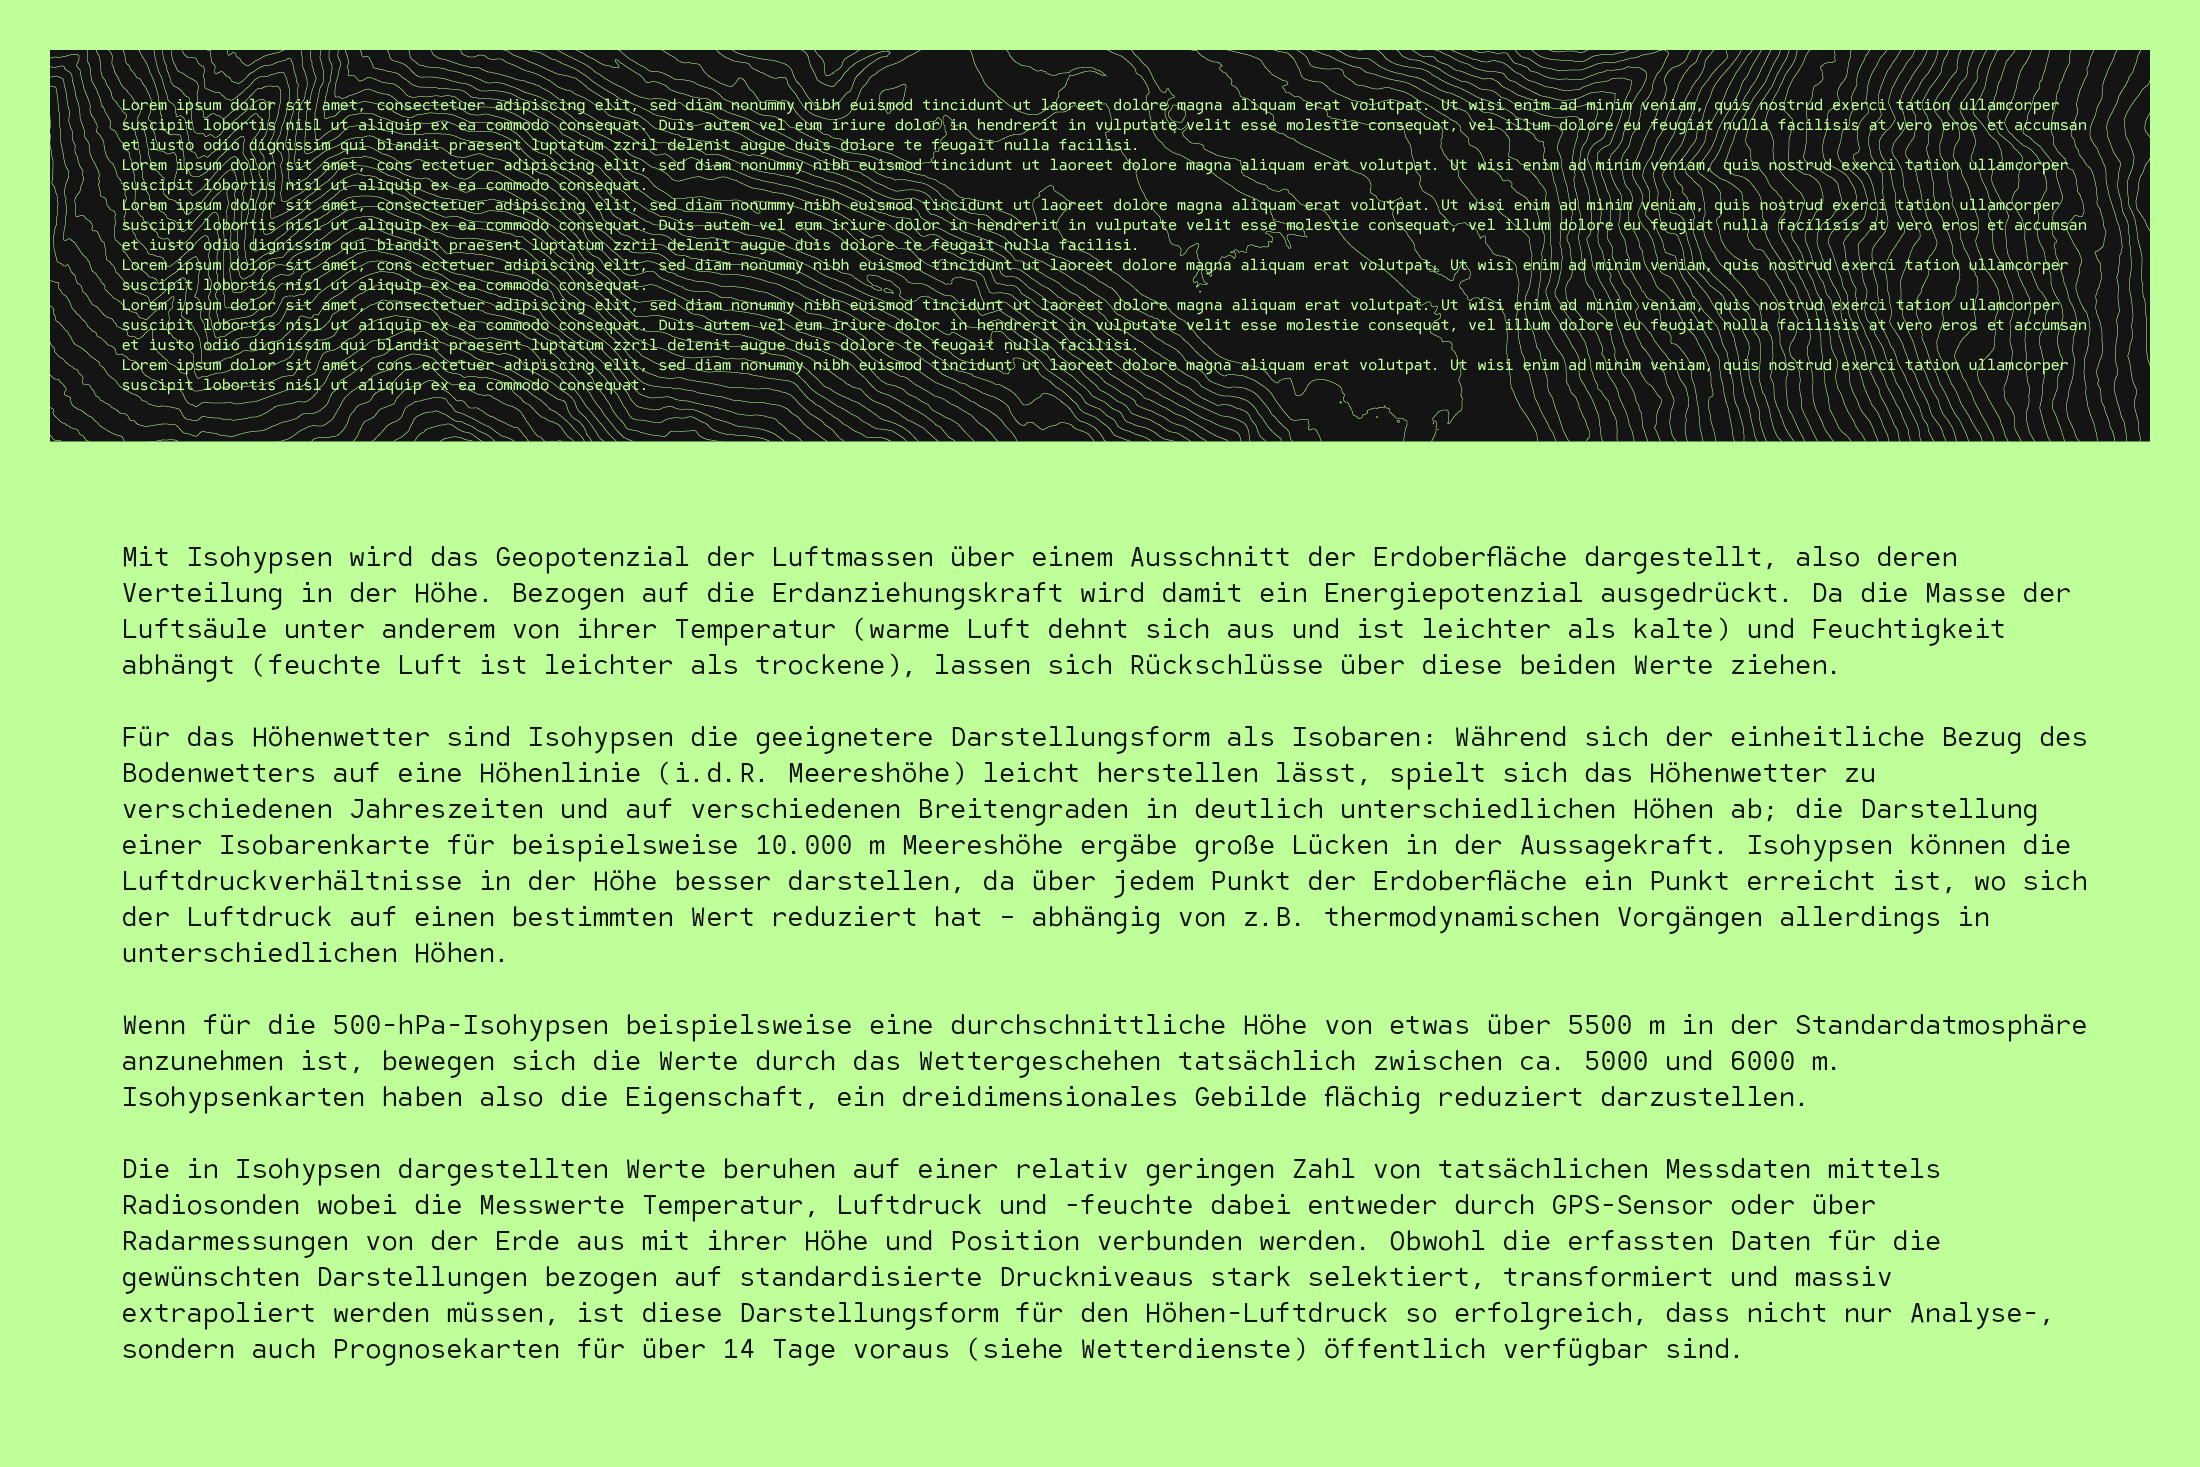 Isohypse_Mono_10-Mitja_Schneehage